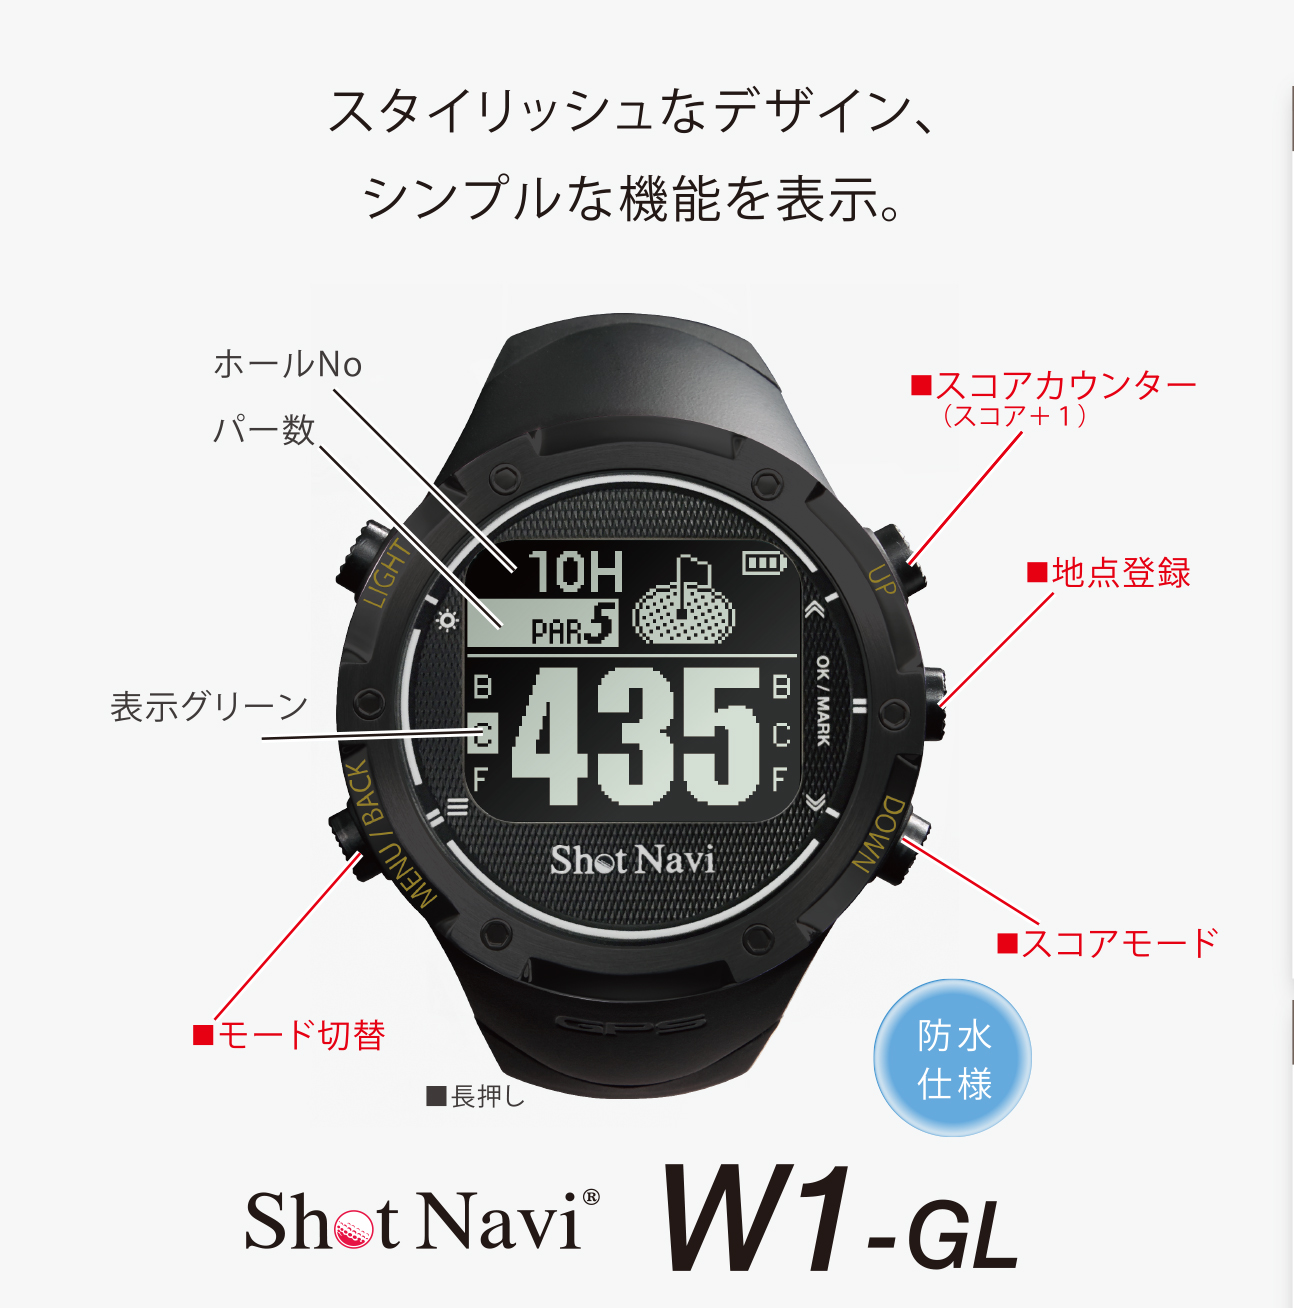 GPSゴルフナビ ShotNavi W1-GL ブラック